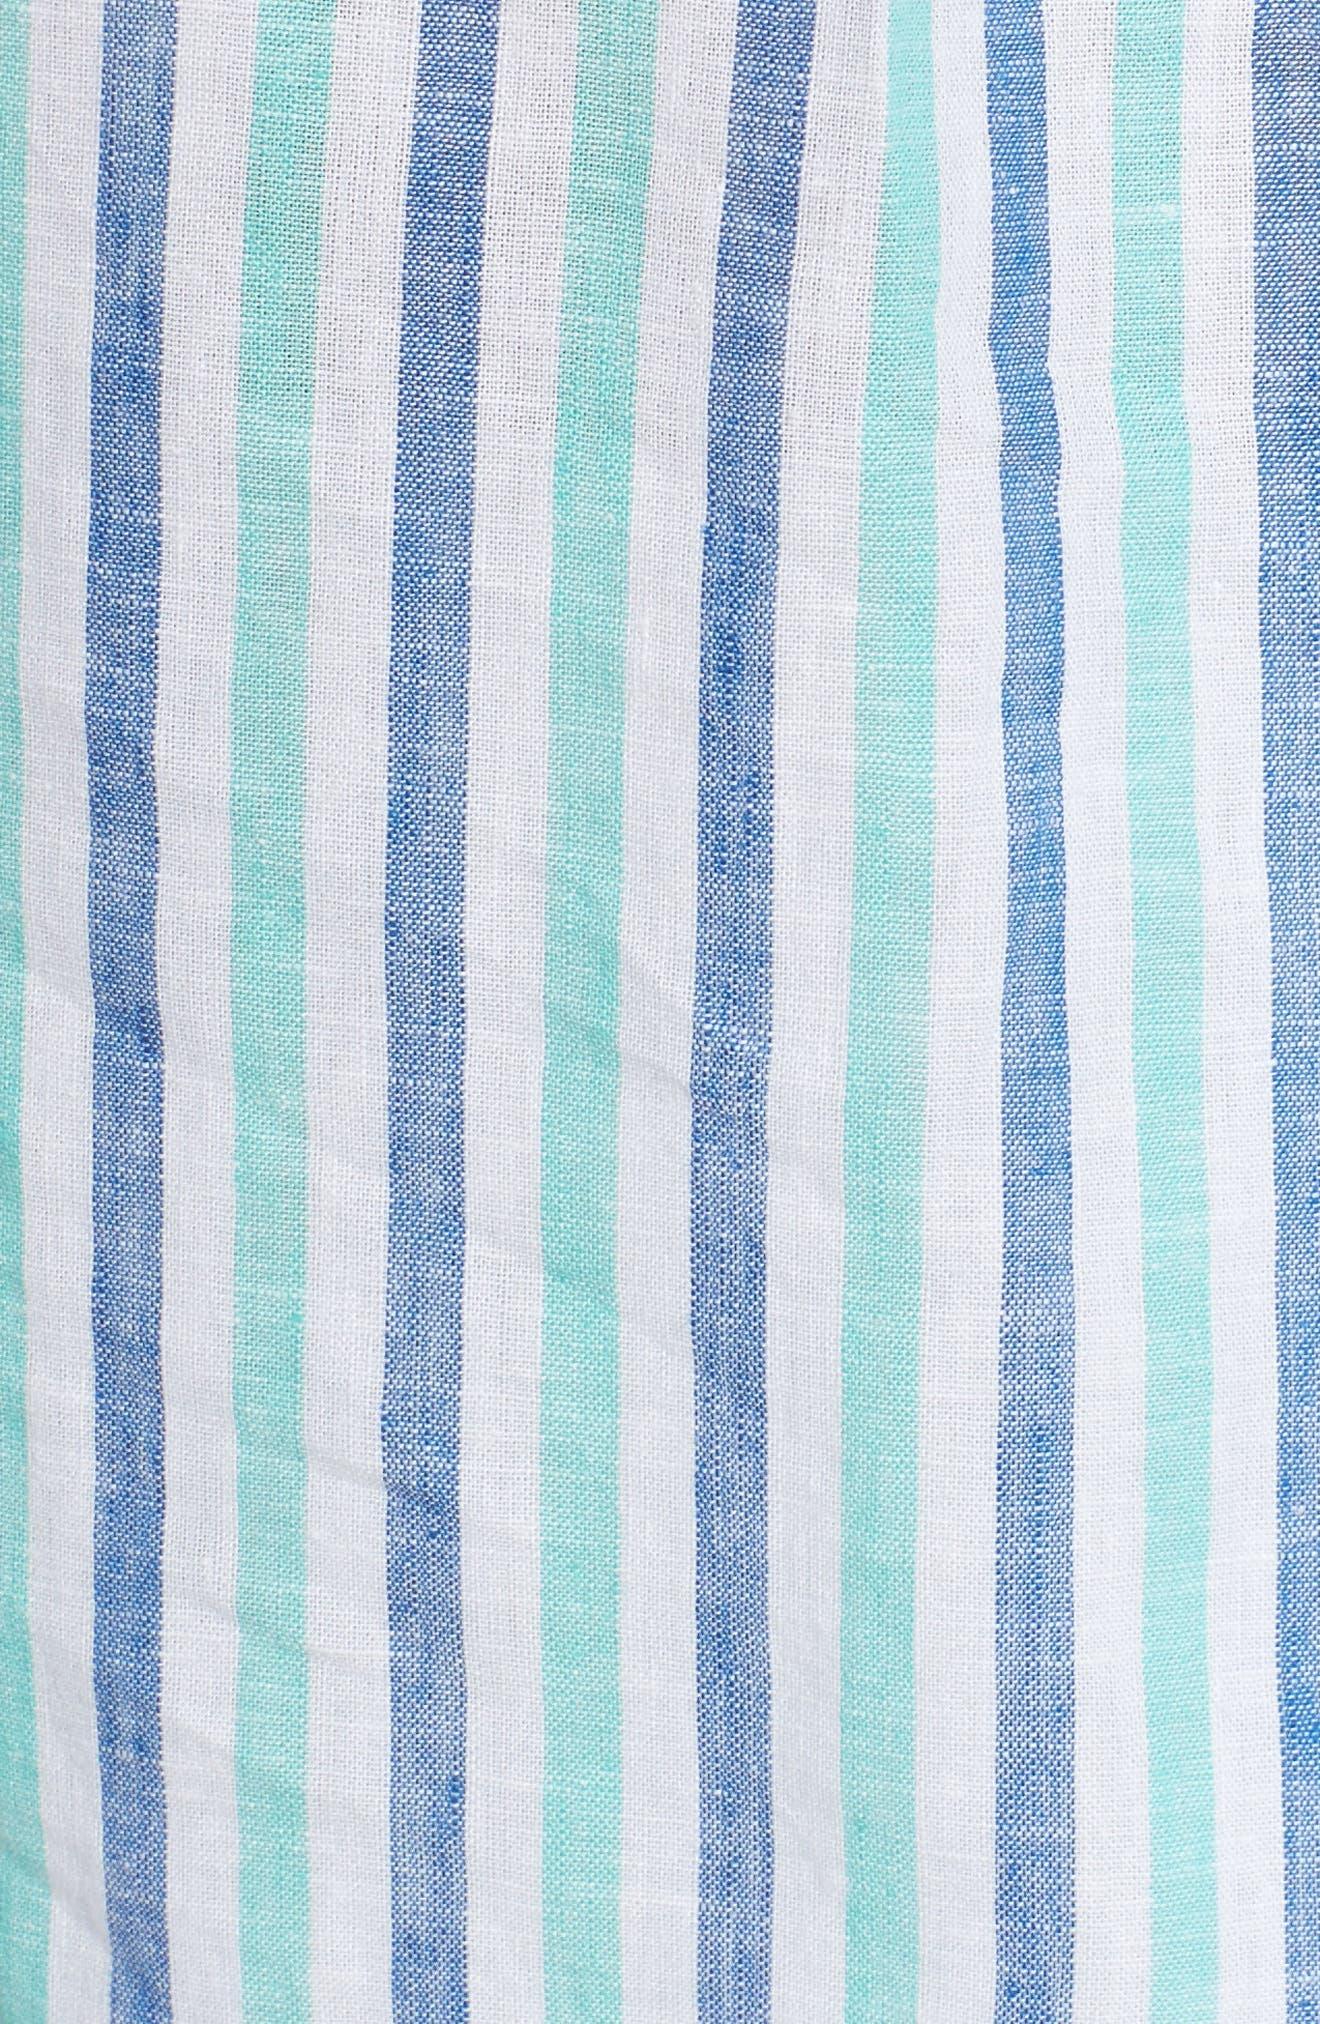 Hope Bay Linen Cotton Stripe Top,                             Alternate thumbnail 6, color,                             Capri Blue